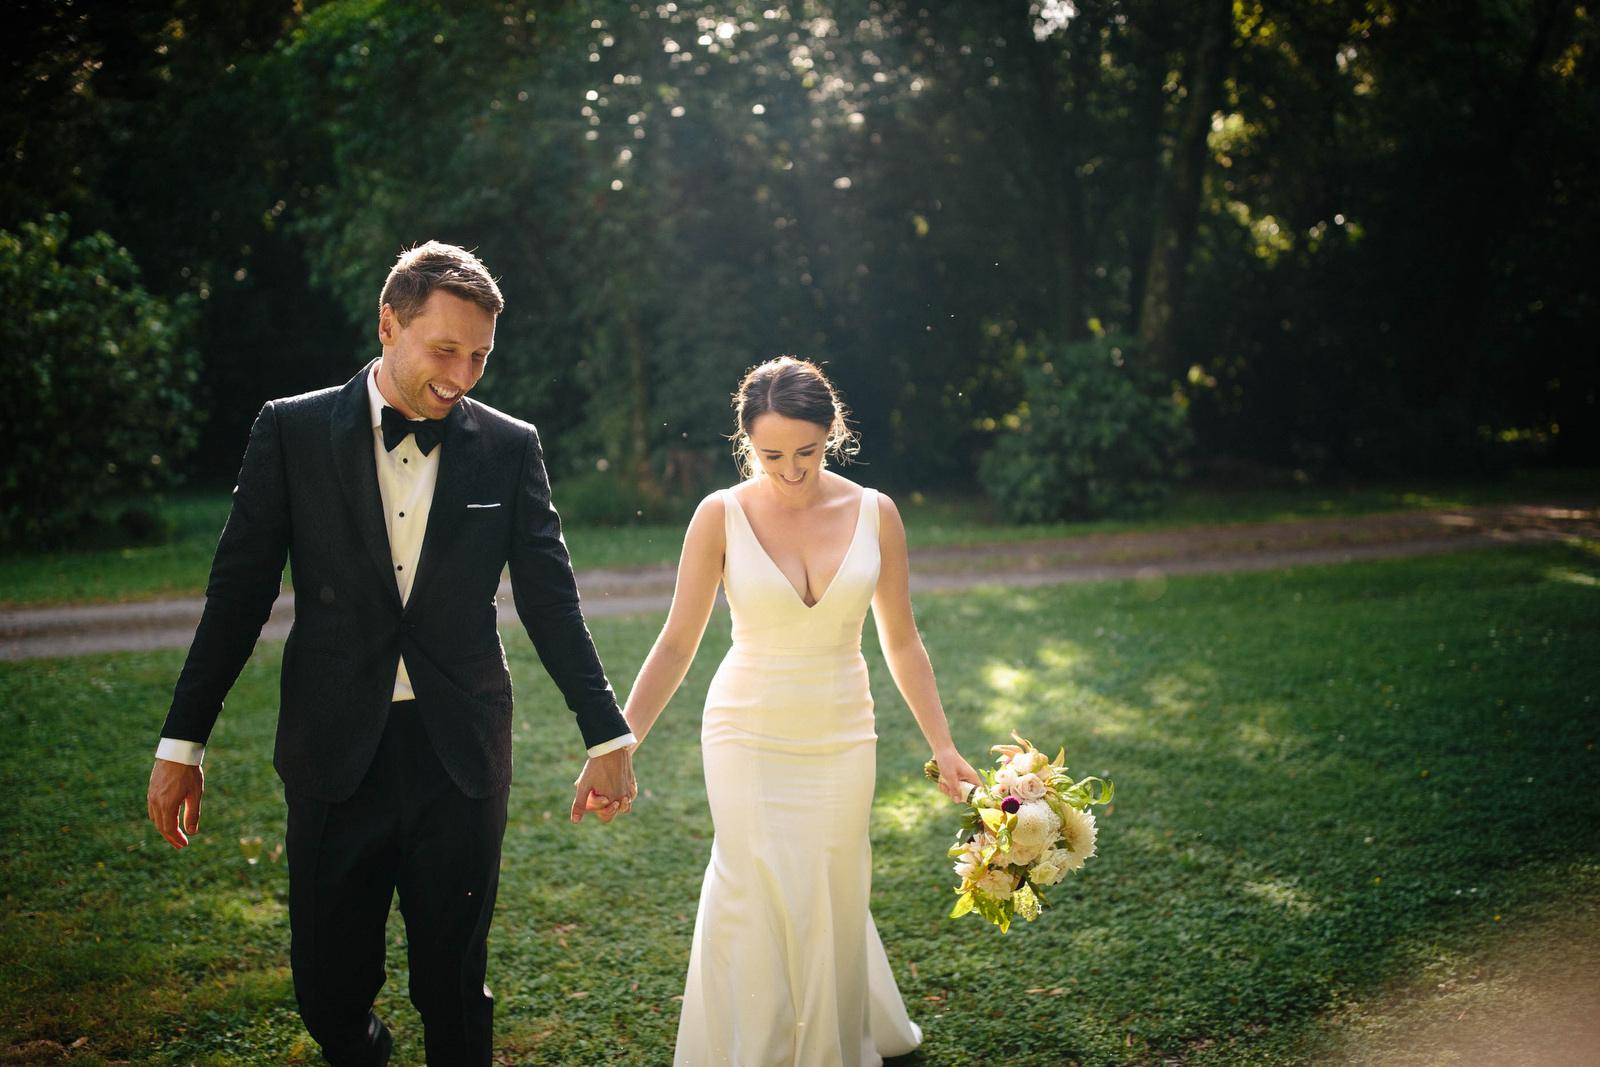 wedding-venue-Rose&Smith-25.JPG